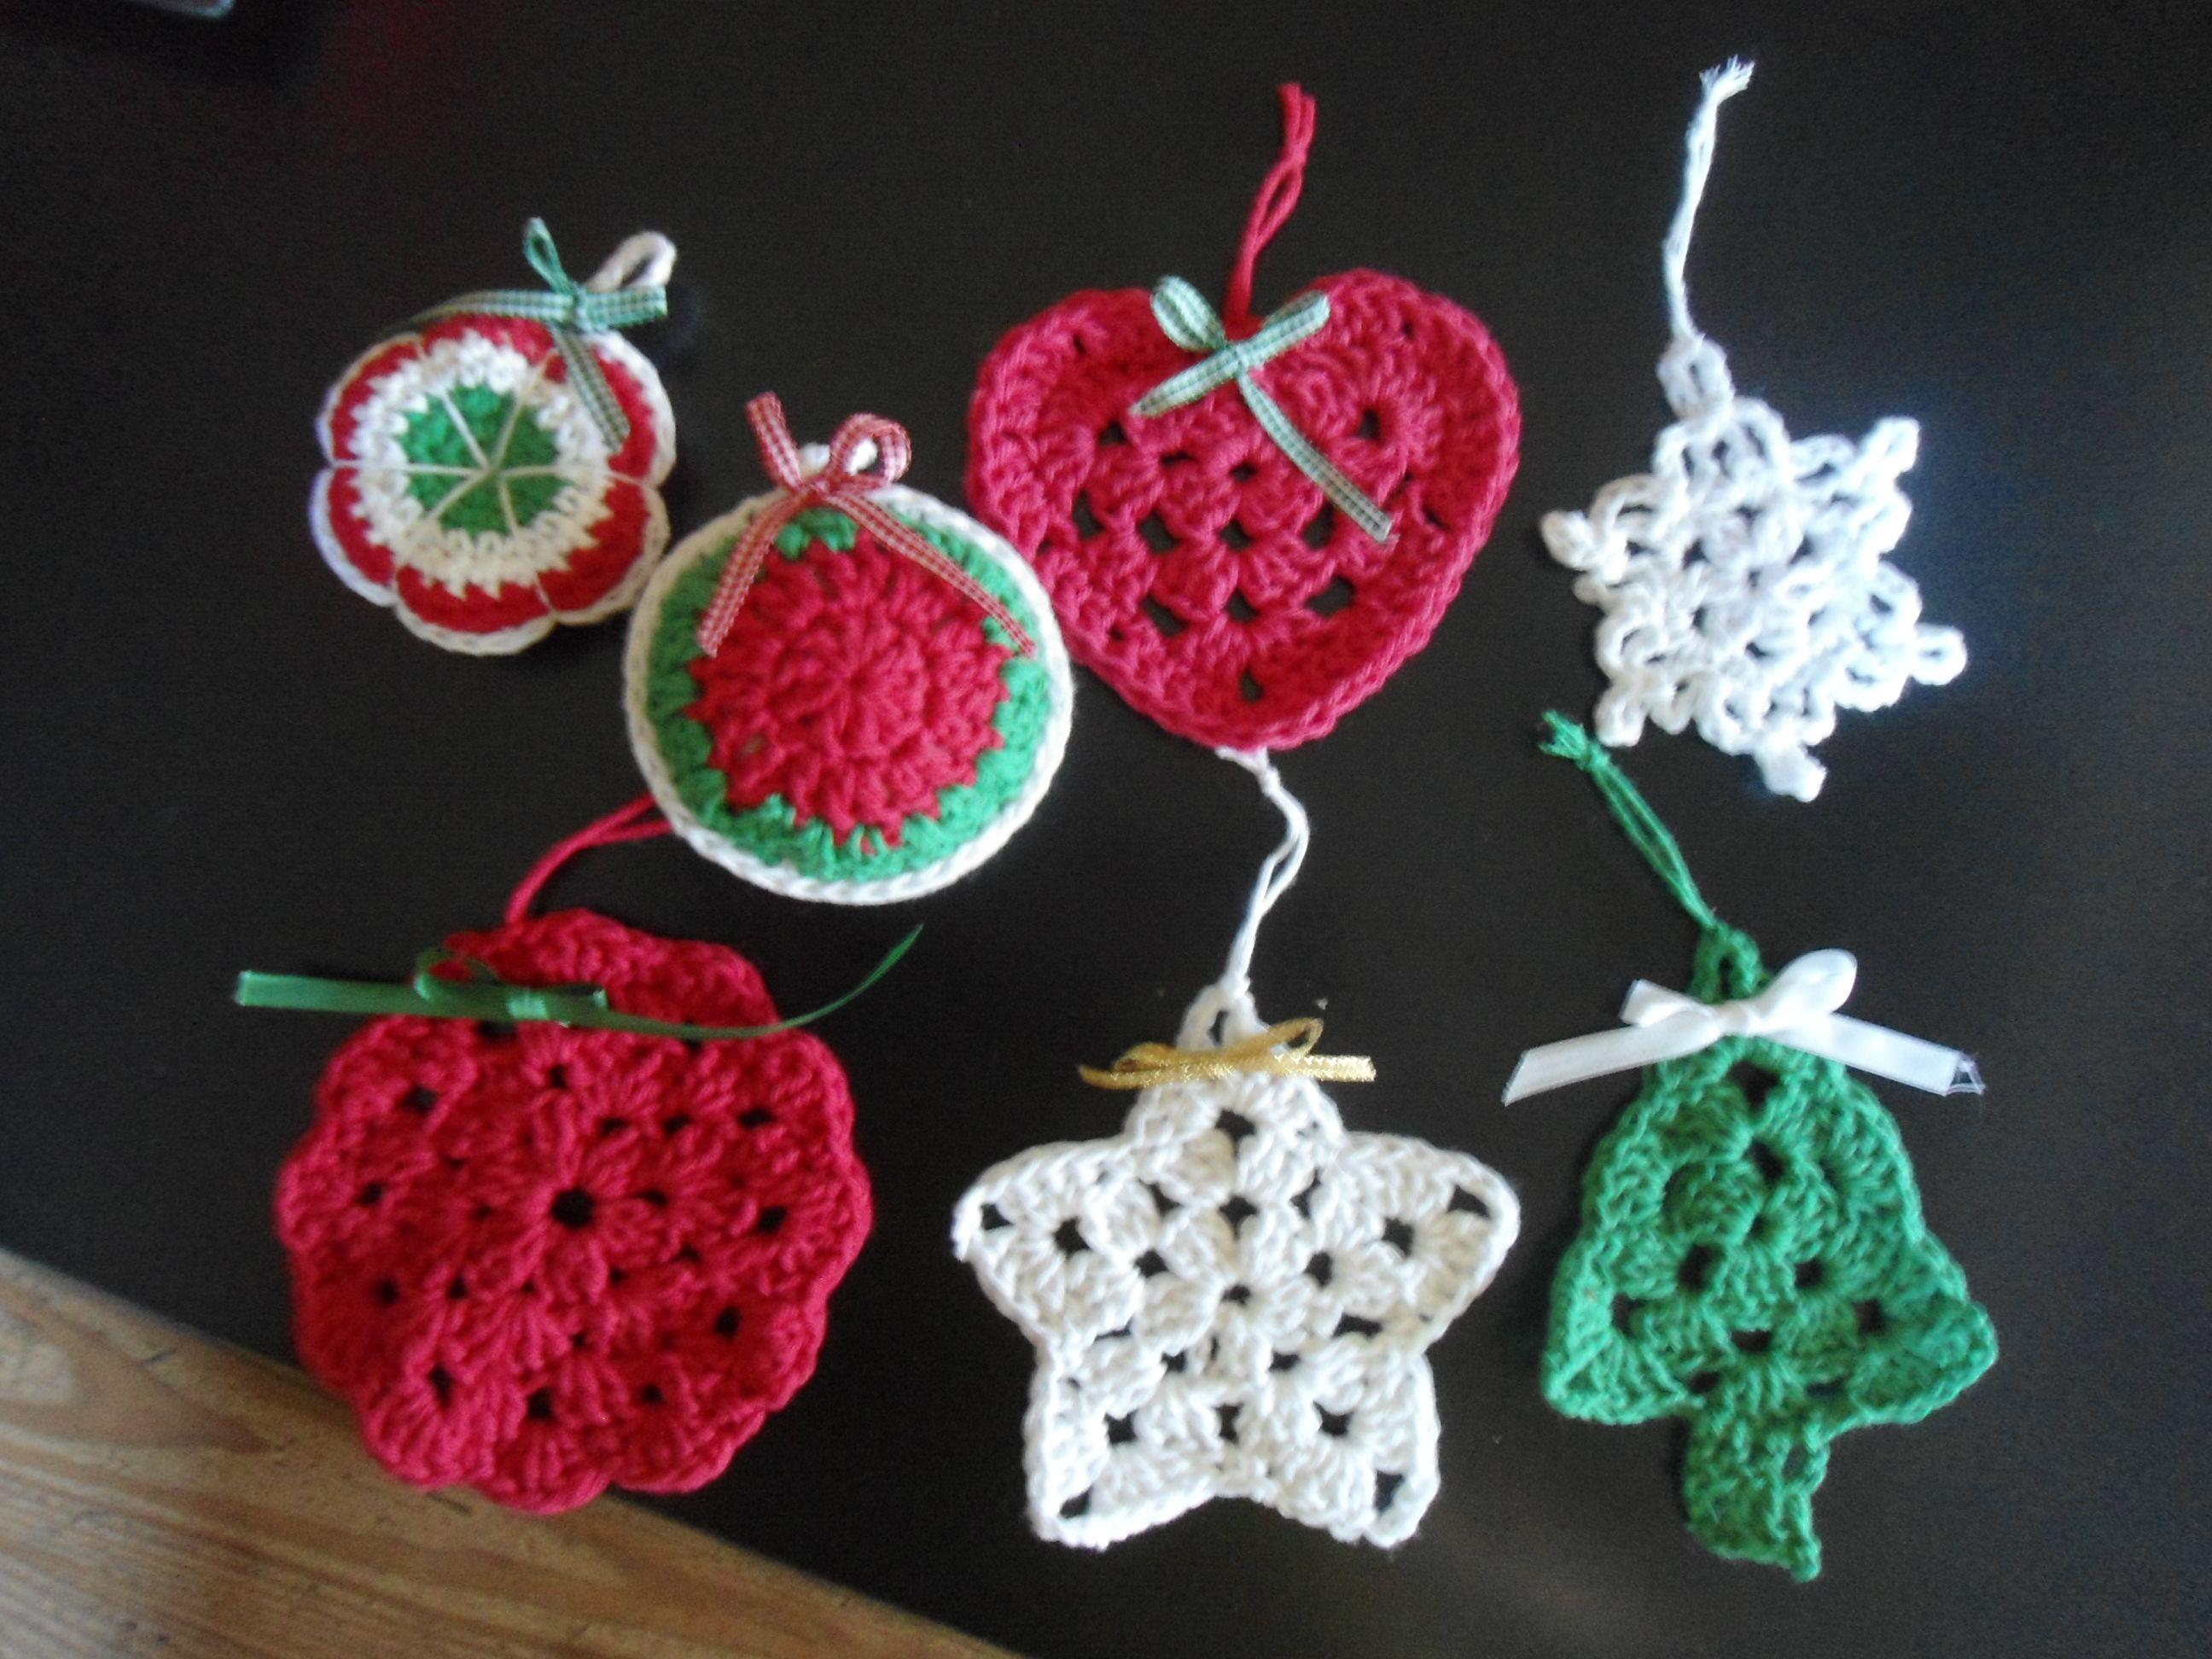 Adornos de navidad faciles affordable adornos navideos for Adornos navidenos tejidos a crochet 2016